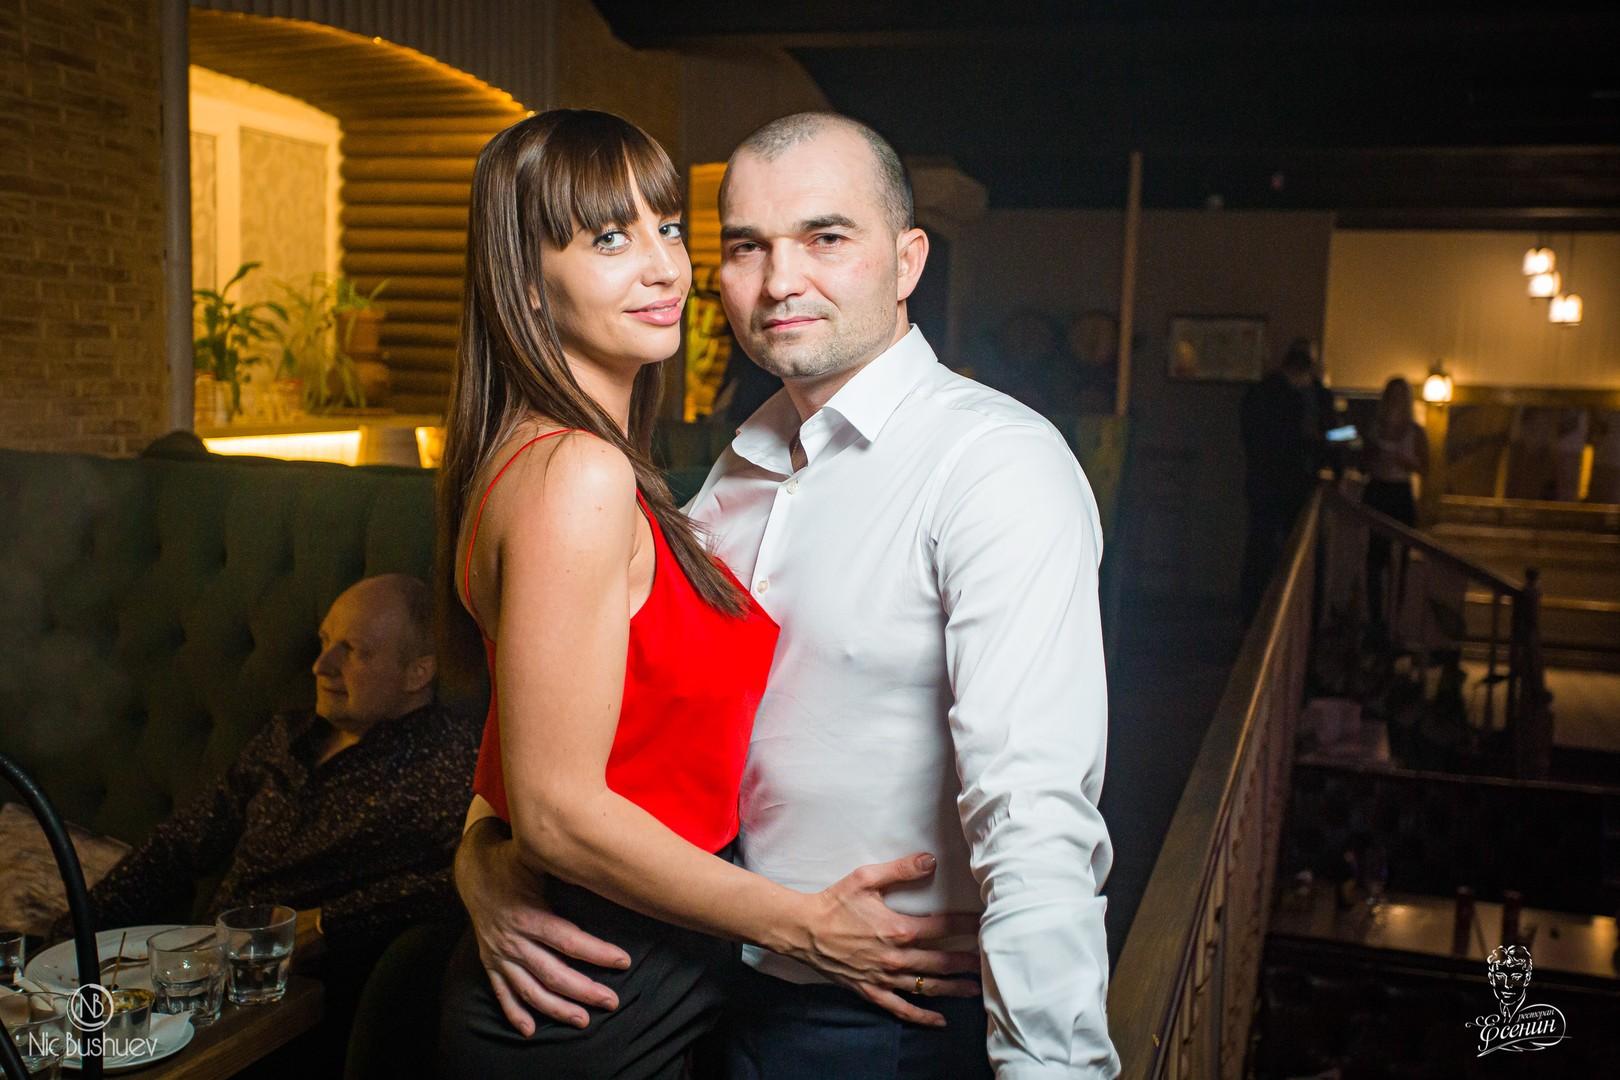 Ресторан Орехово-Зуево Есенин 14_02_2020 (44)